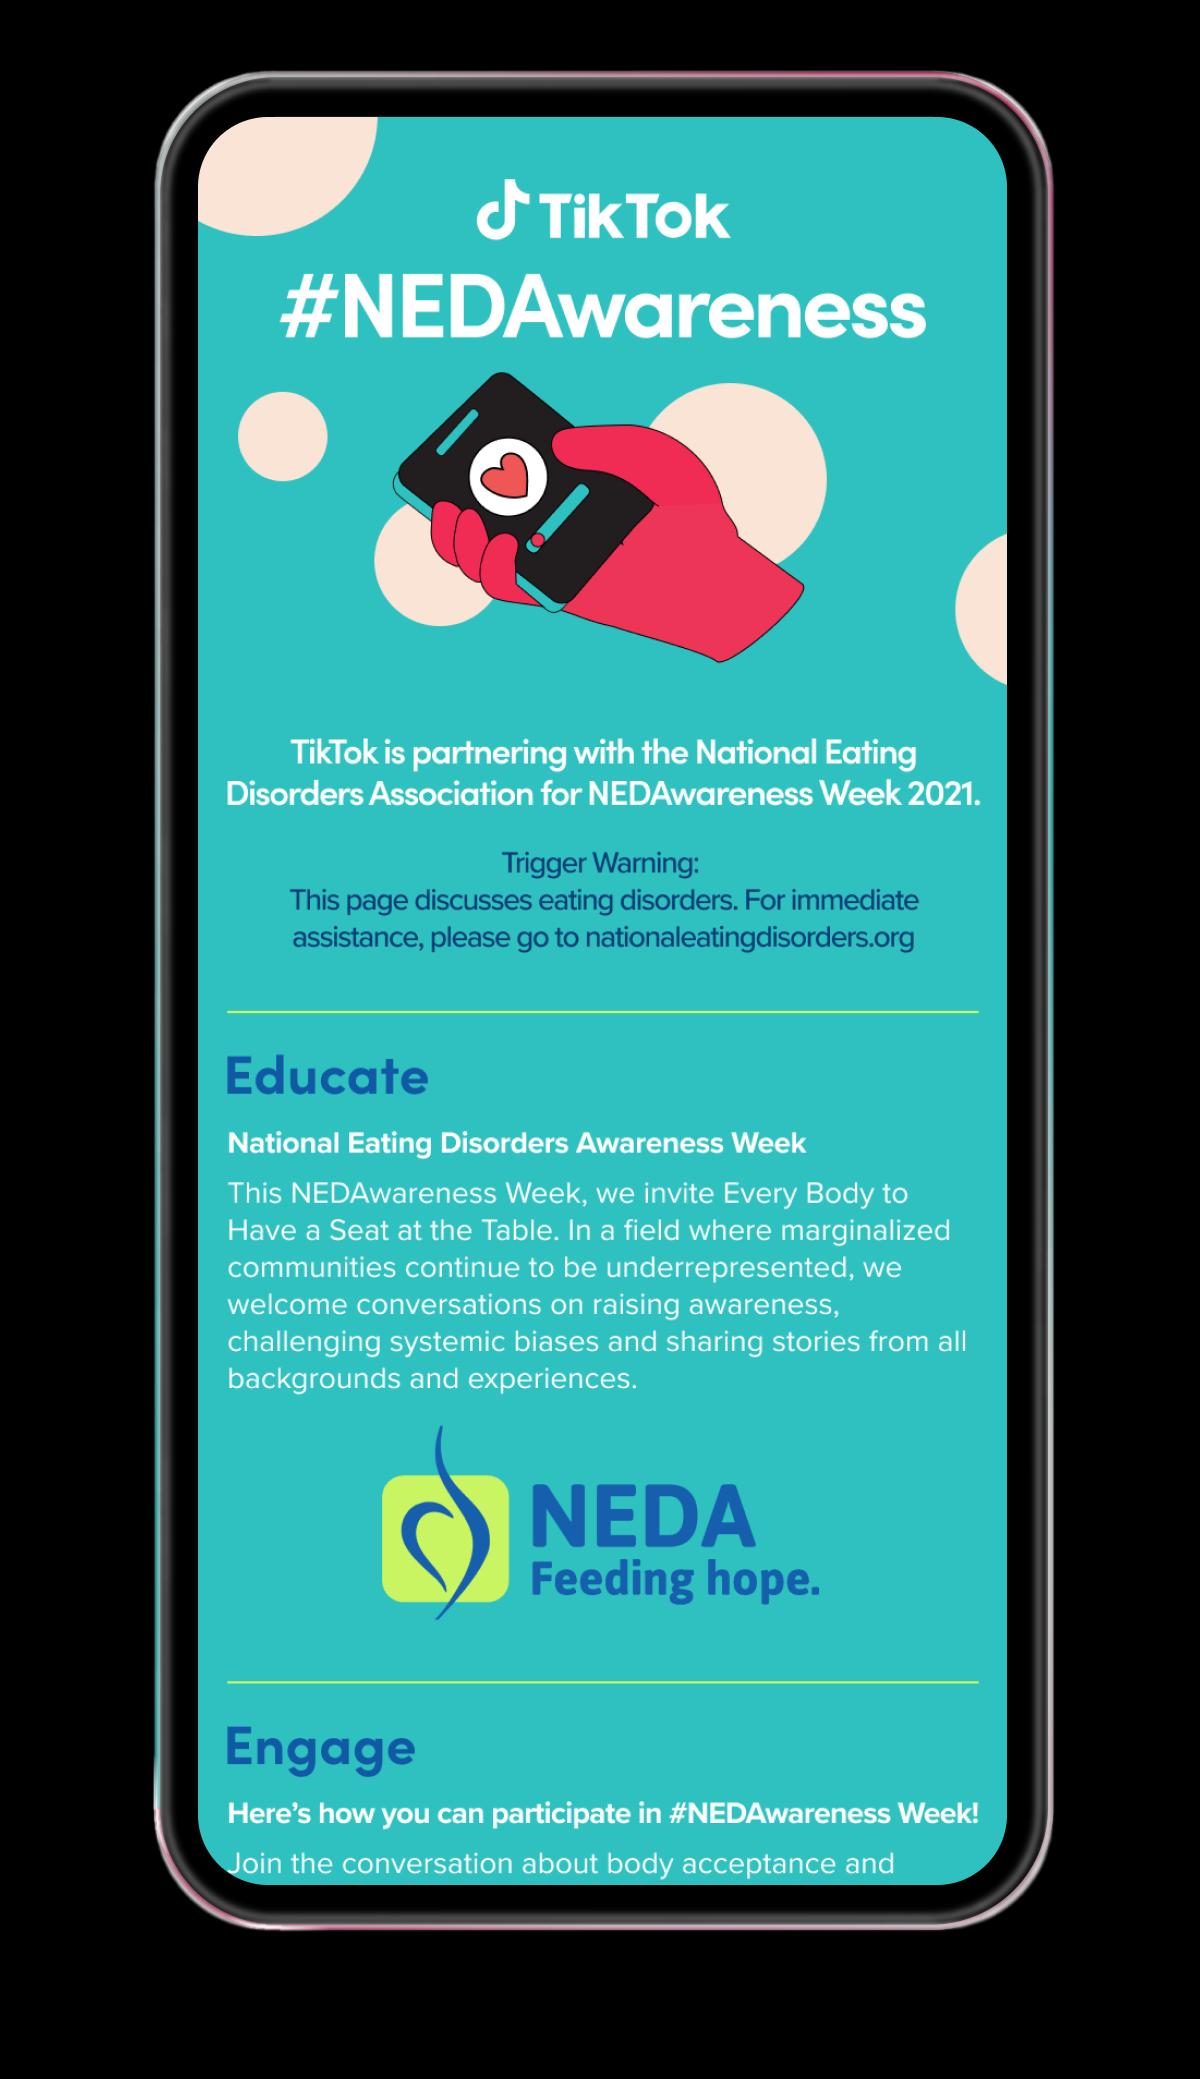 #NEDAwareness campaign promoting by TikTok